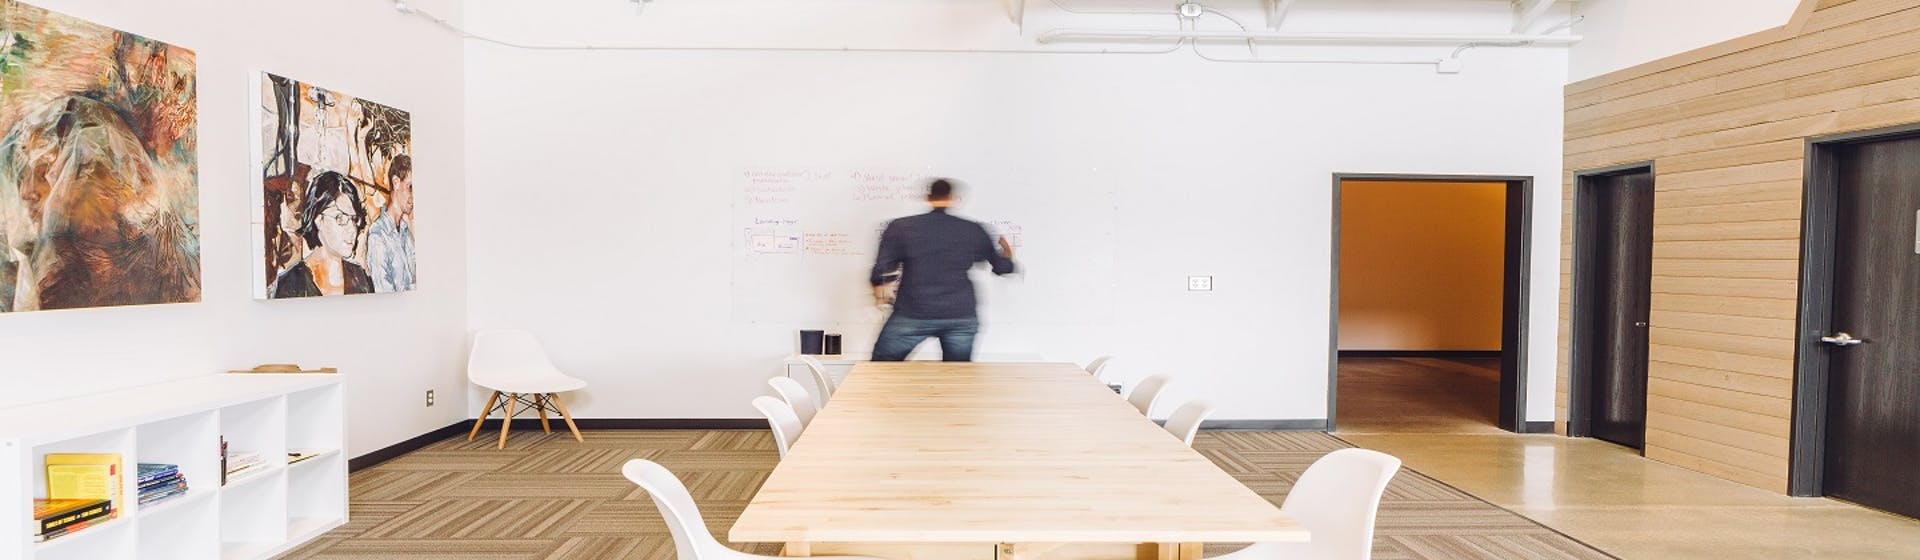 Líderes millennials: ¿Qué rasgos definen un buen liderazgo millennial?